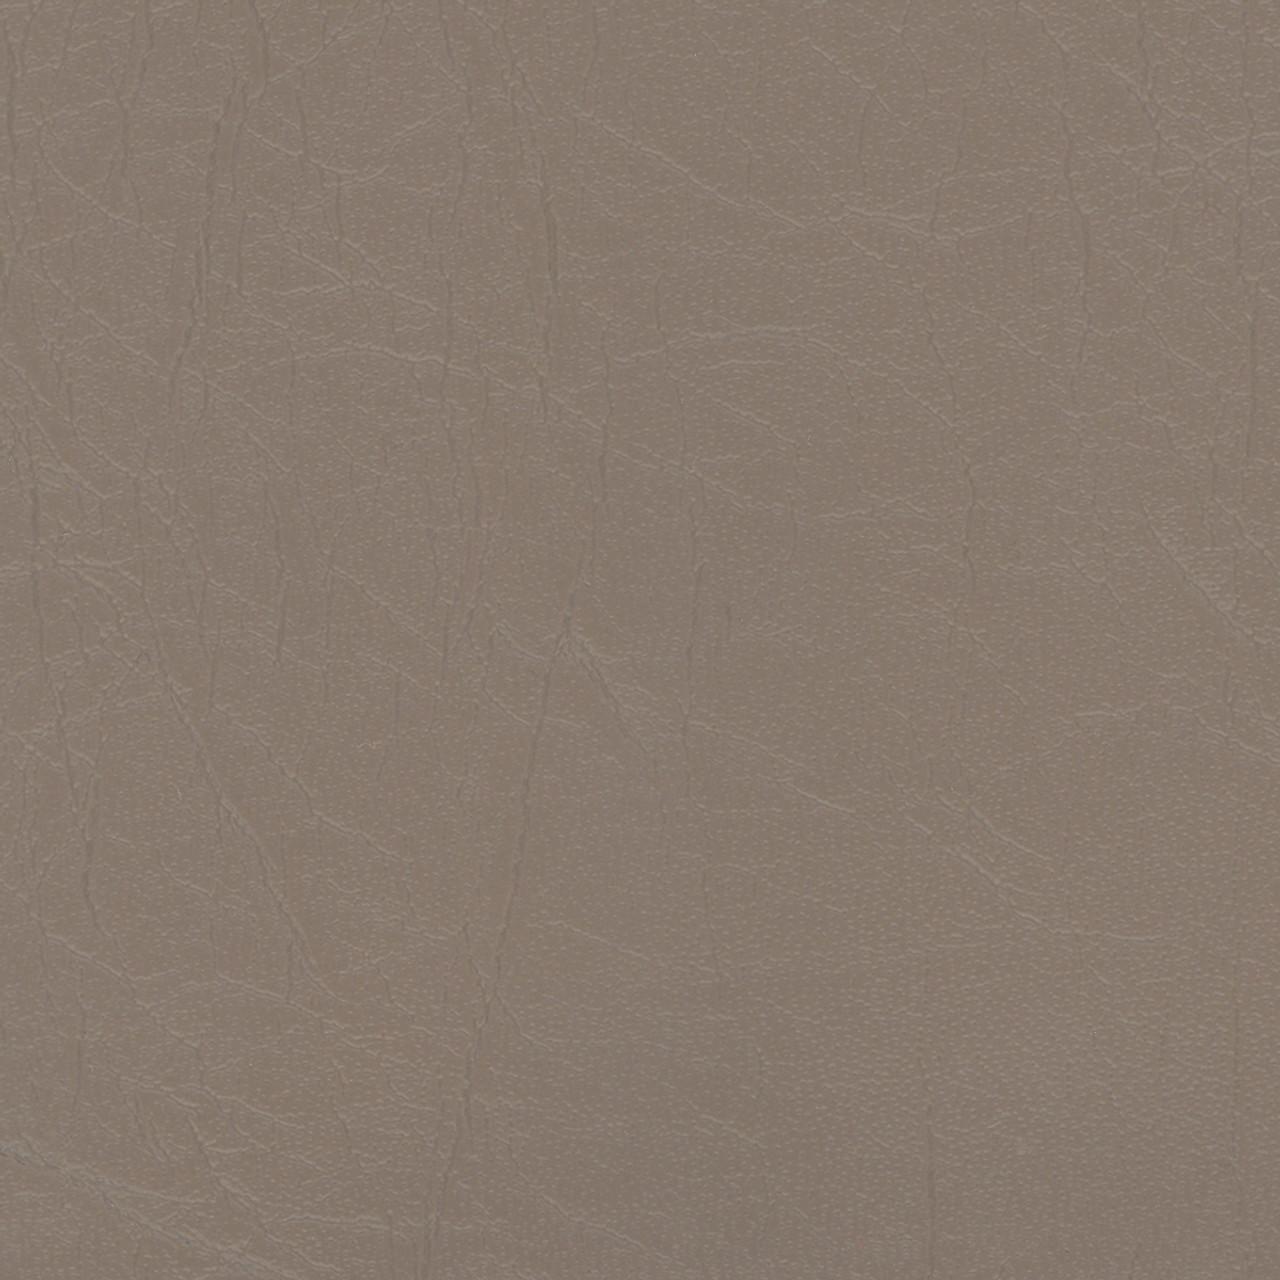 Aries ARI-1605 Pebble